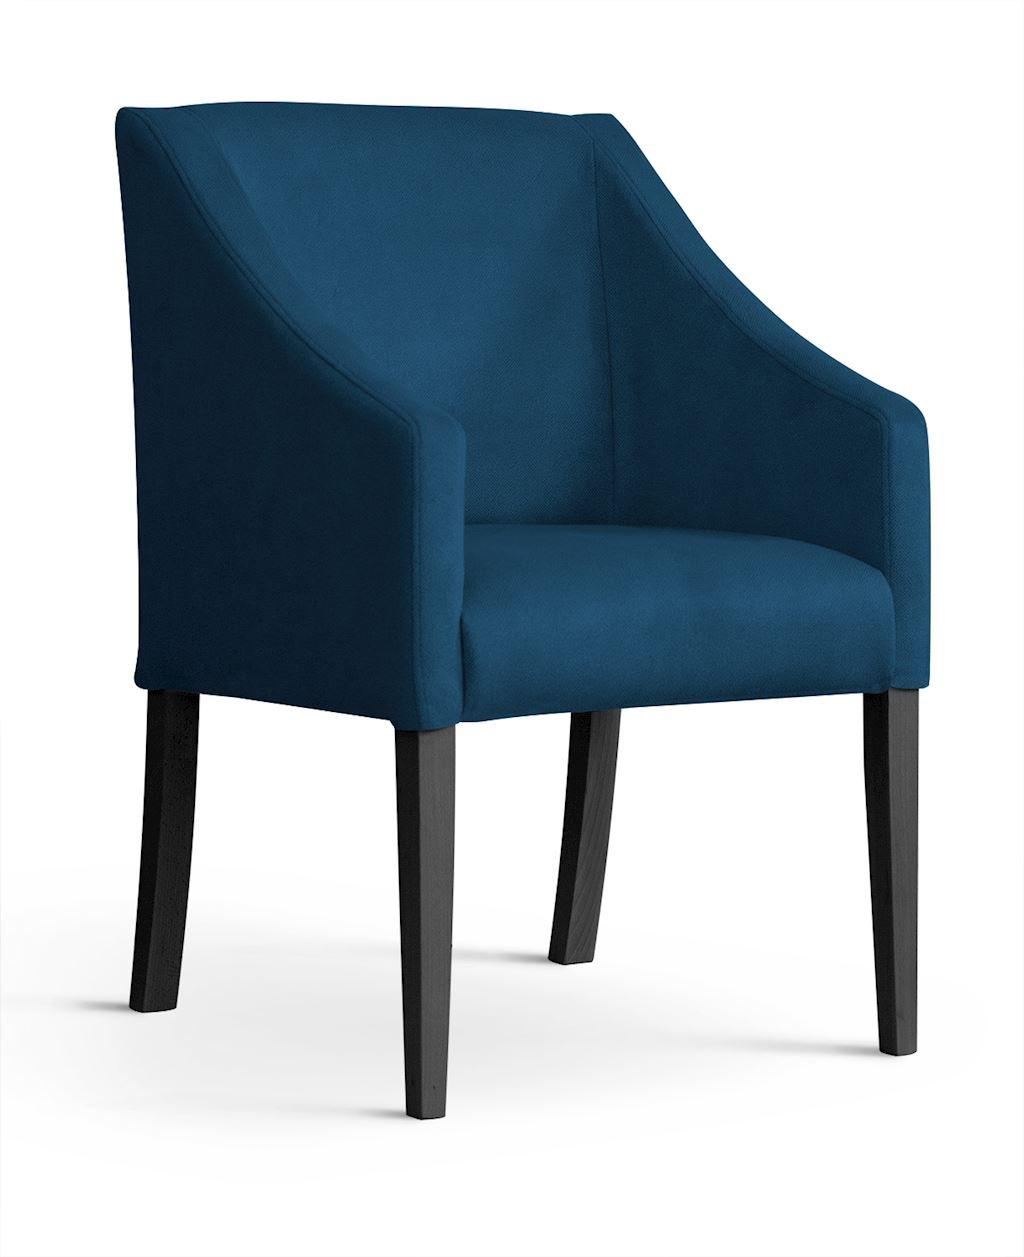 Fotoliu fix tapitat cu stofa, cu picioare din lemn Capri Navy Blue / Black, l58xA60xH89 cm imagine